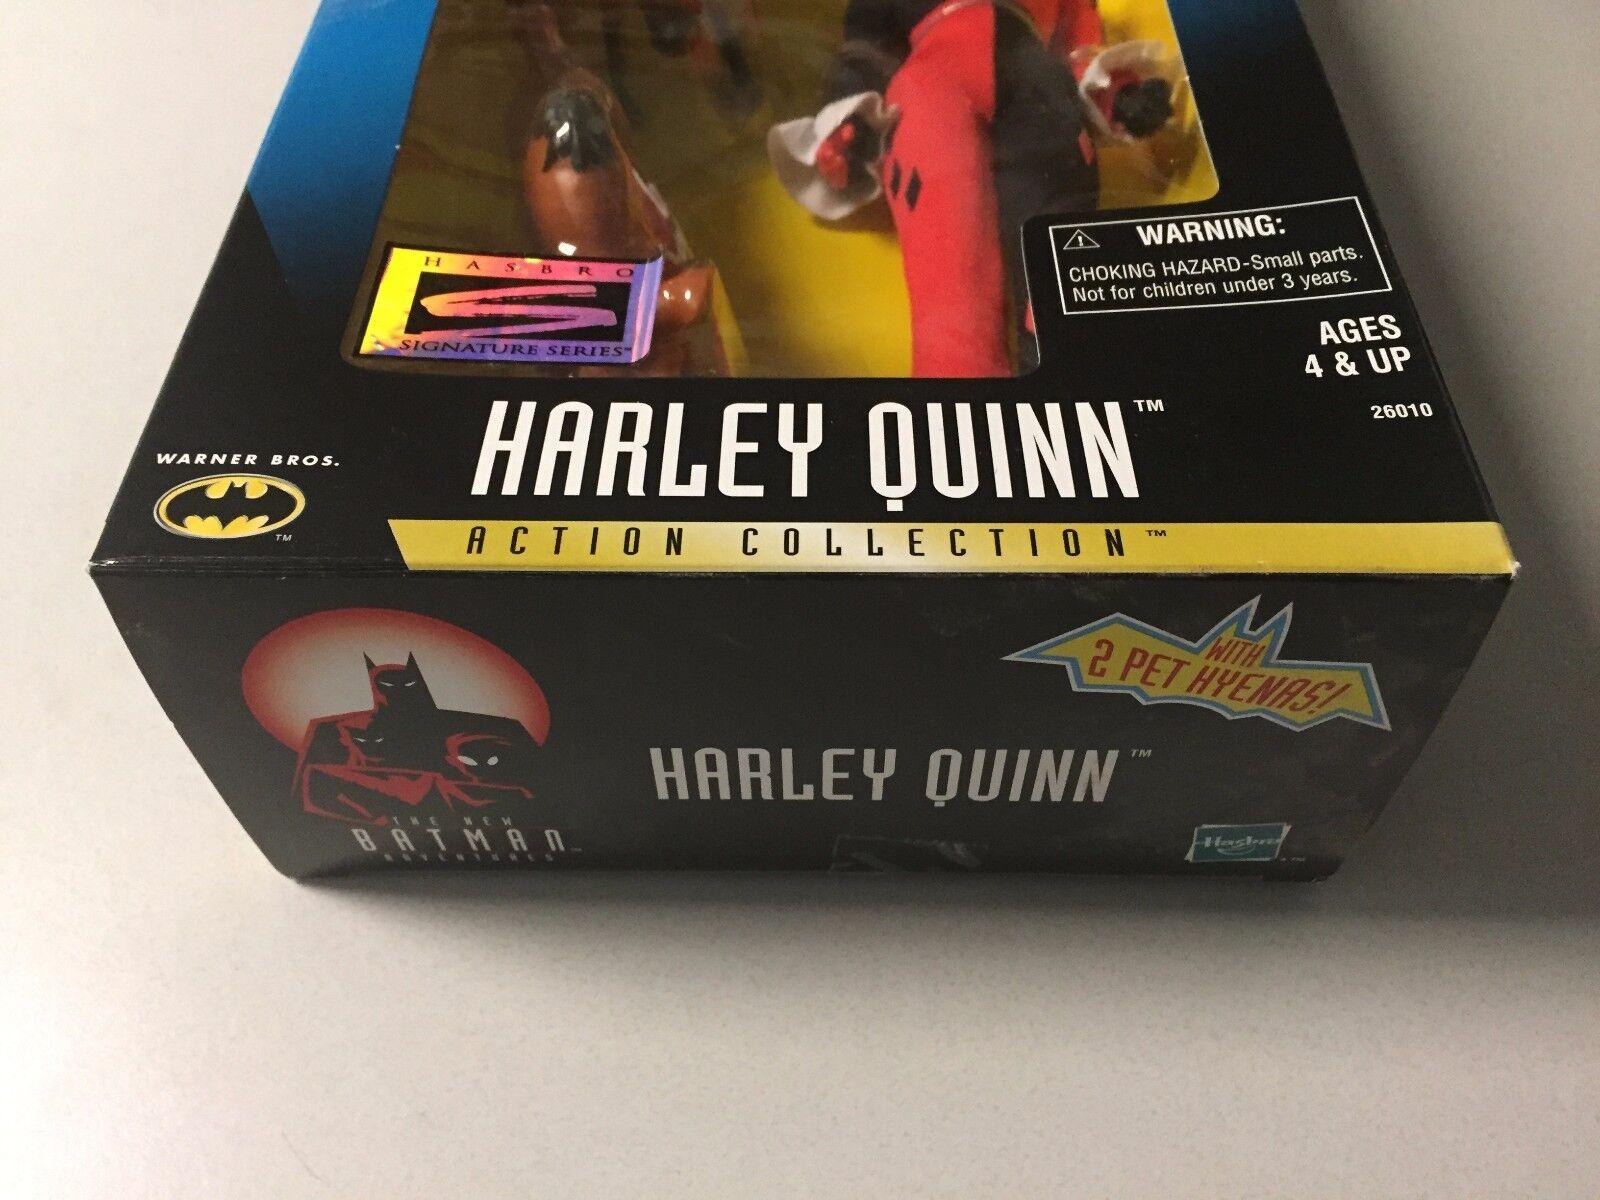 Harley Quinn Batman Adventures Hasbro 12  Action Collection Action Action Action Figure NIB BN b3abfd